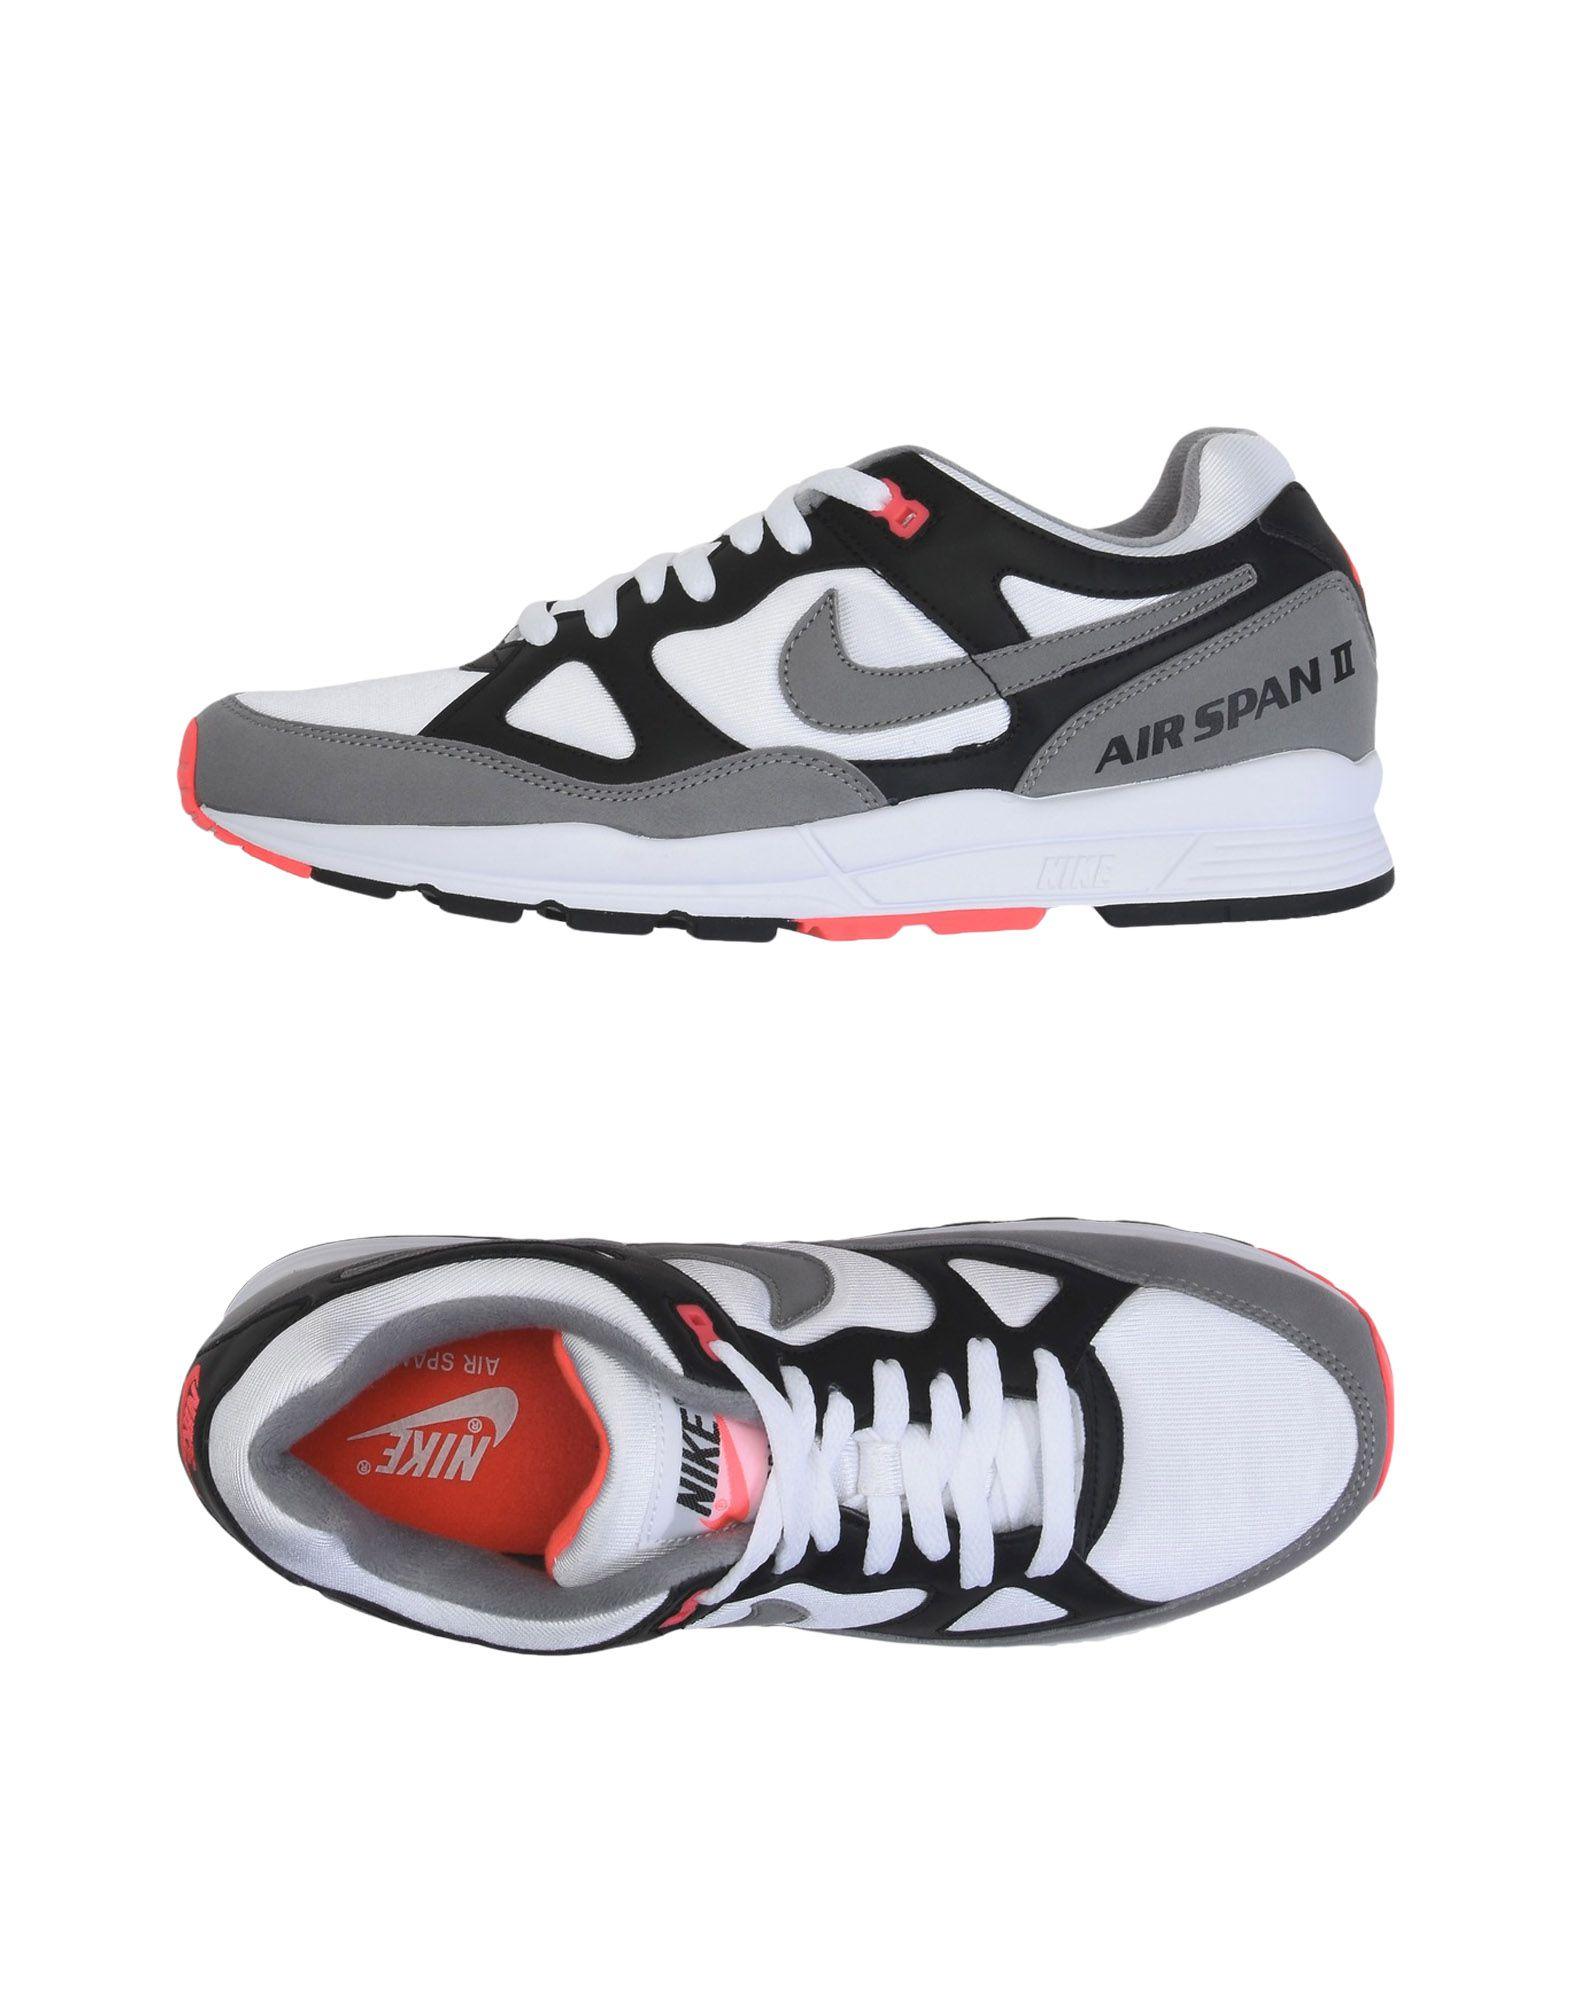 Baskets Nike  Air Span Ii - Homme - baskets Nike   - 11510741WN